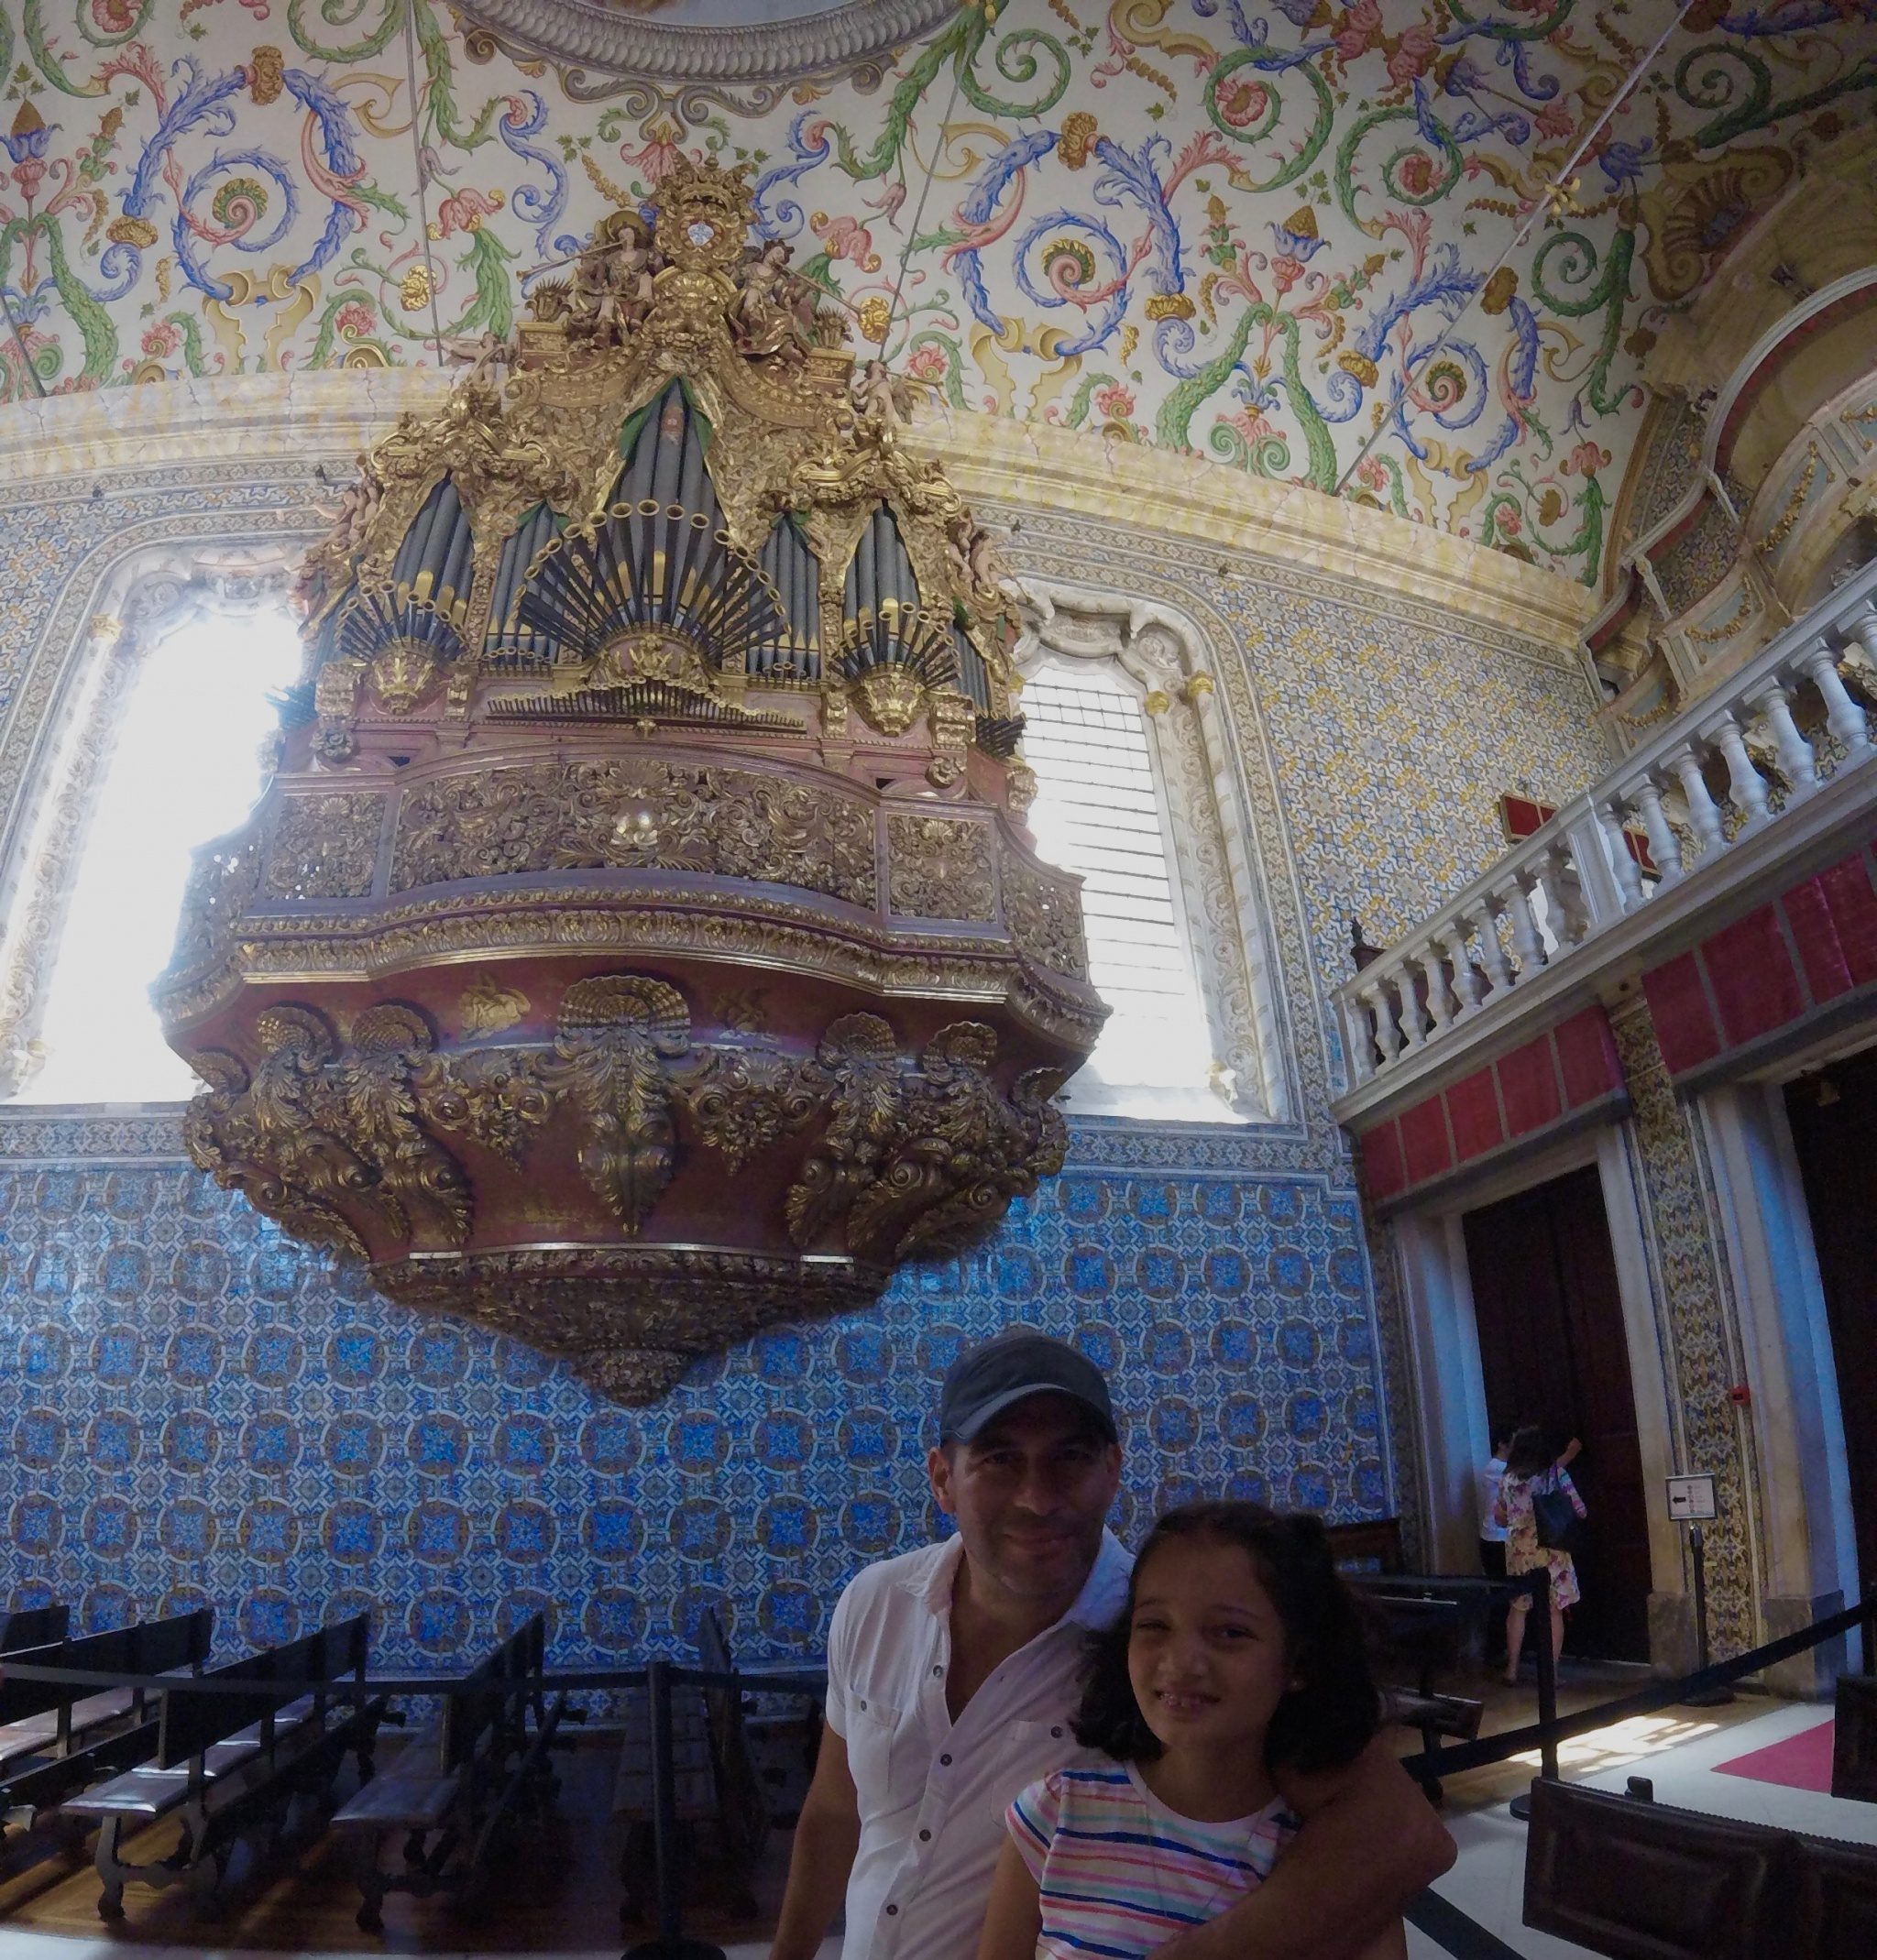 San Miguel Chapel in Coimbra